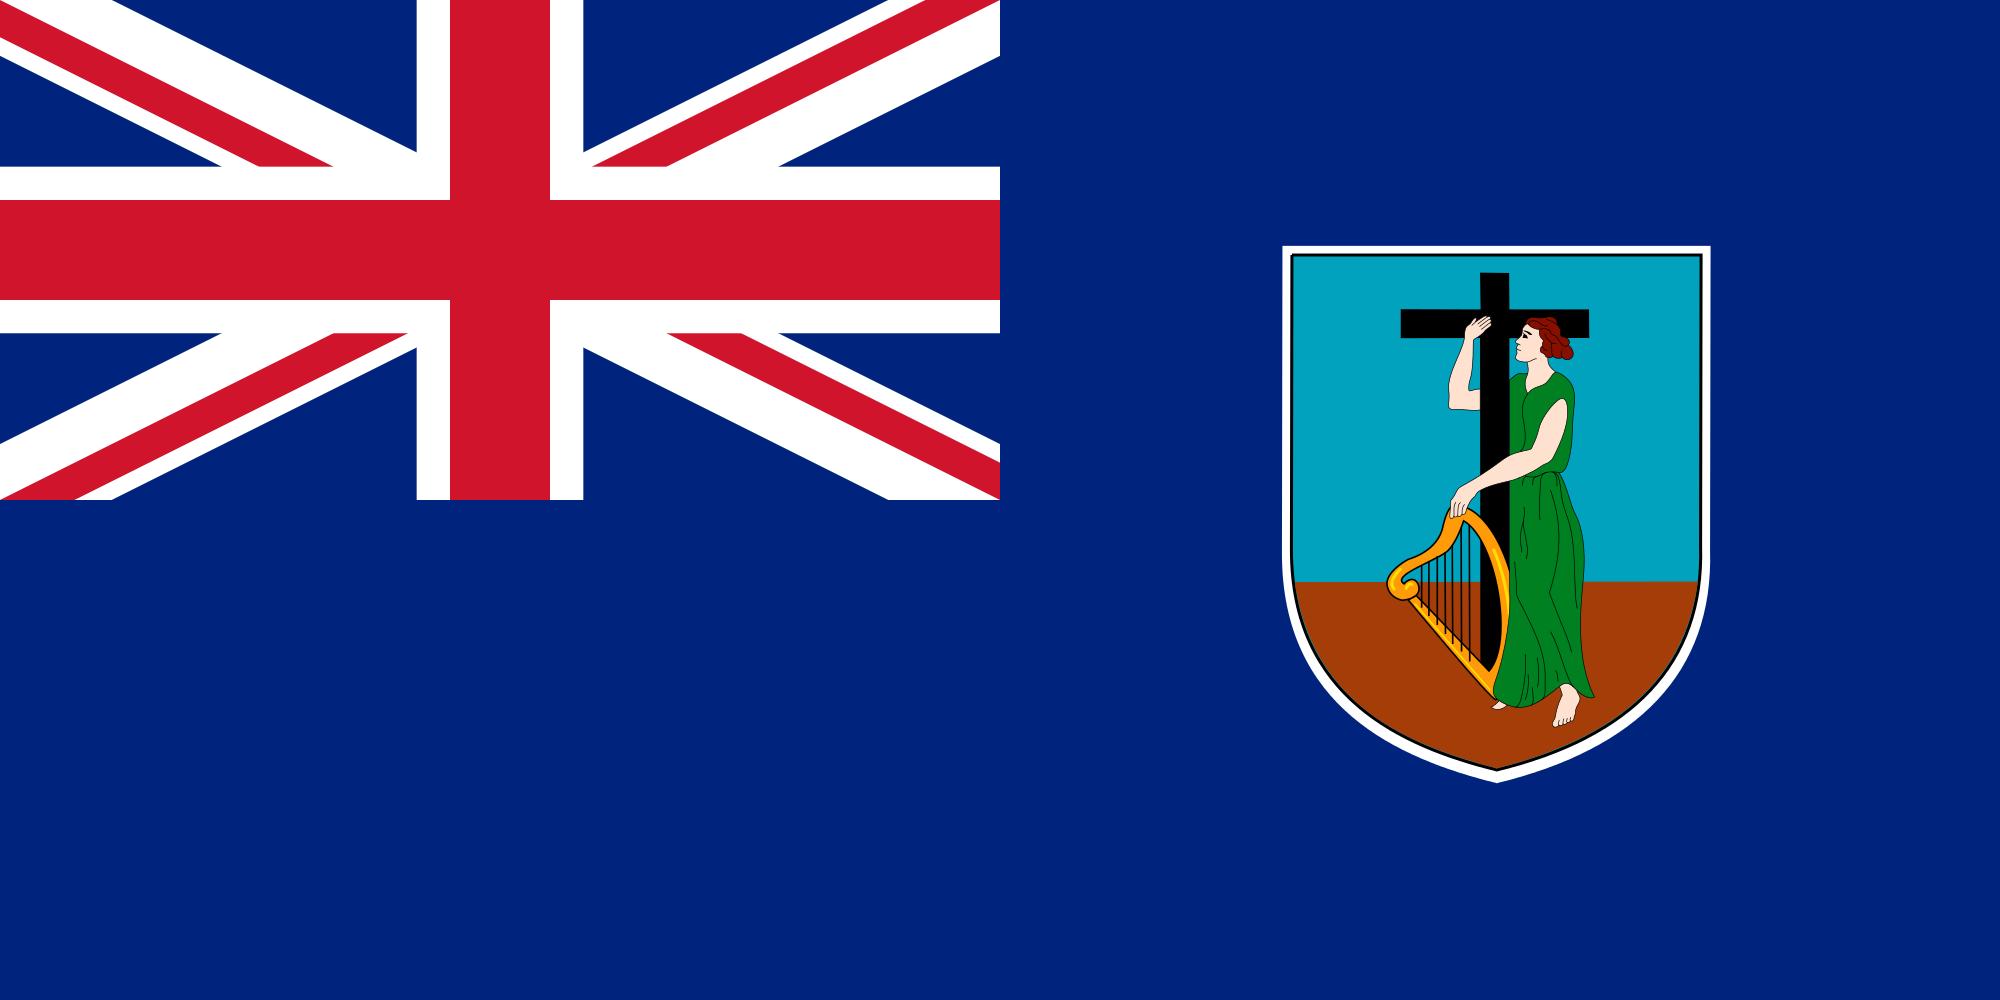 montserrat, paese, emblema, logo, simbolo - Sfondi HD - Professor-falken.com